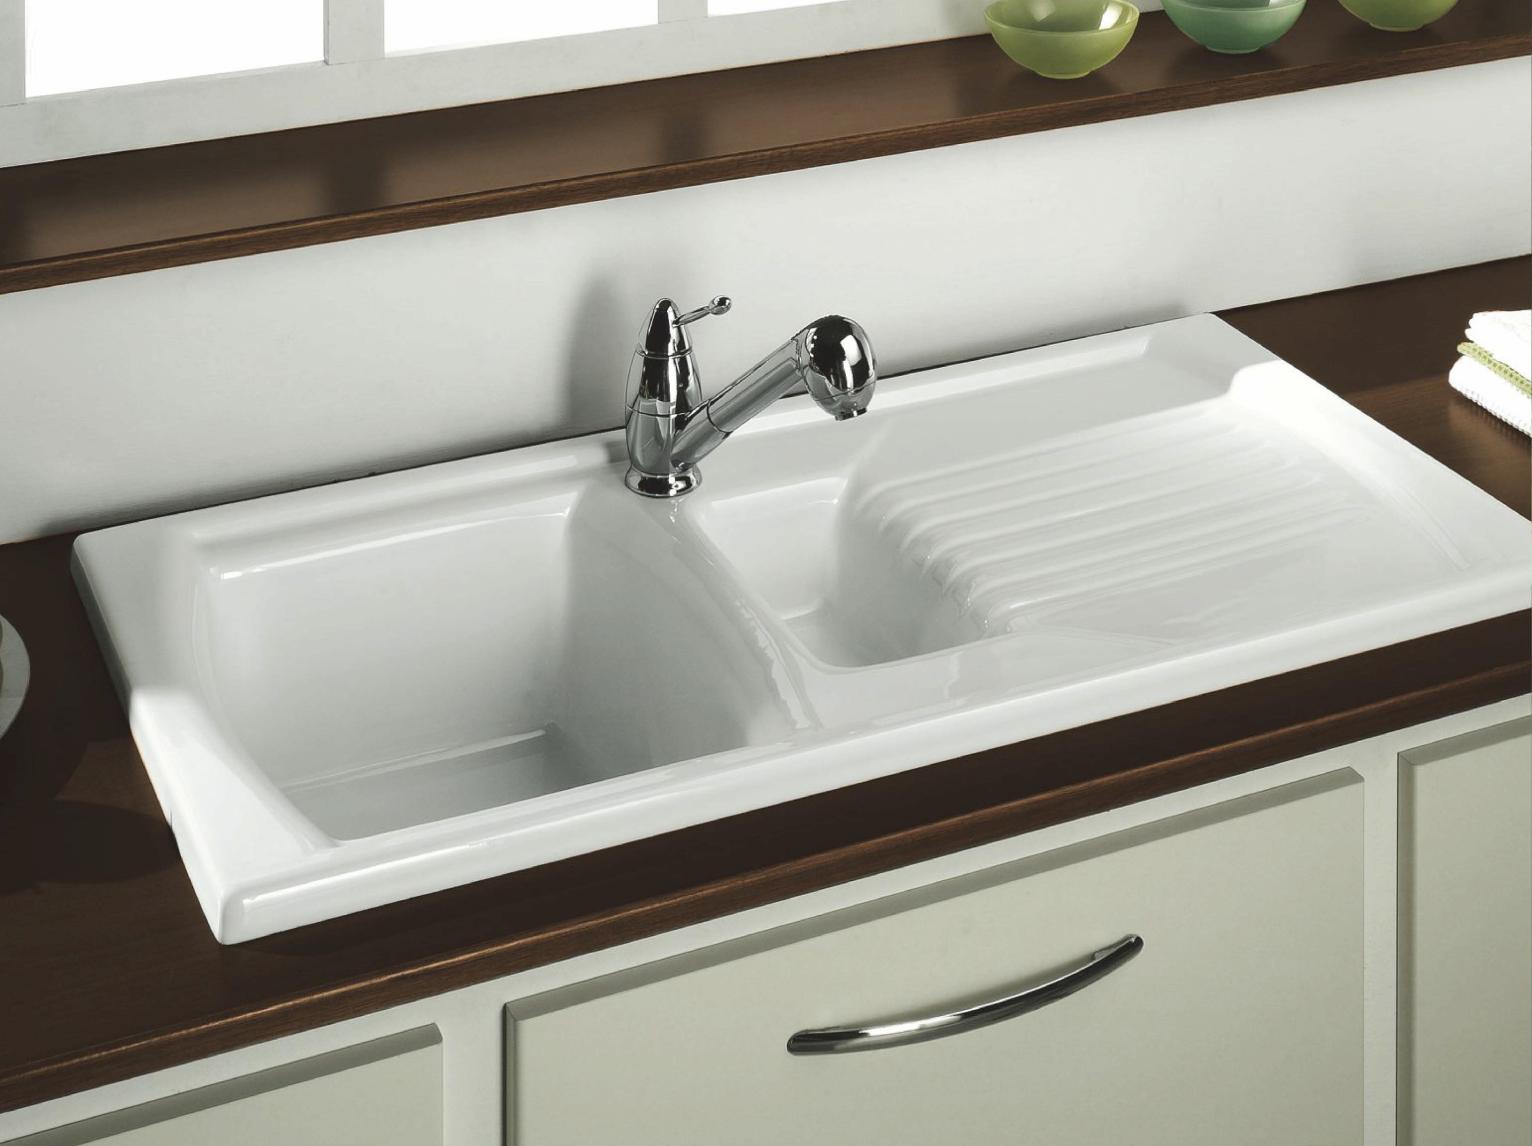 Lustitano Inset Sink 1 ½ Bowl